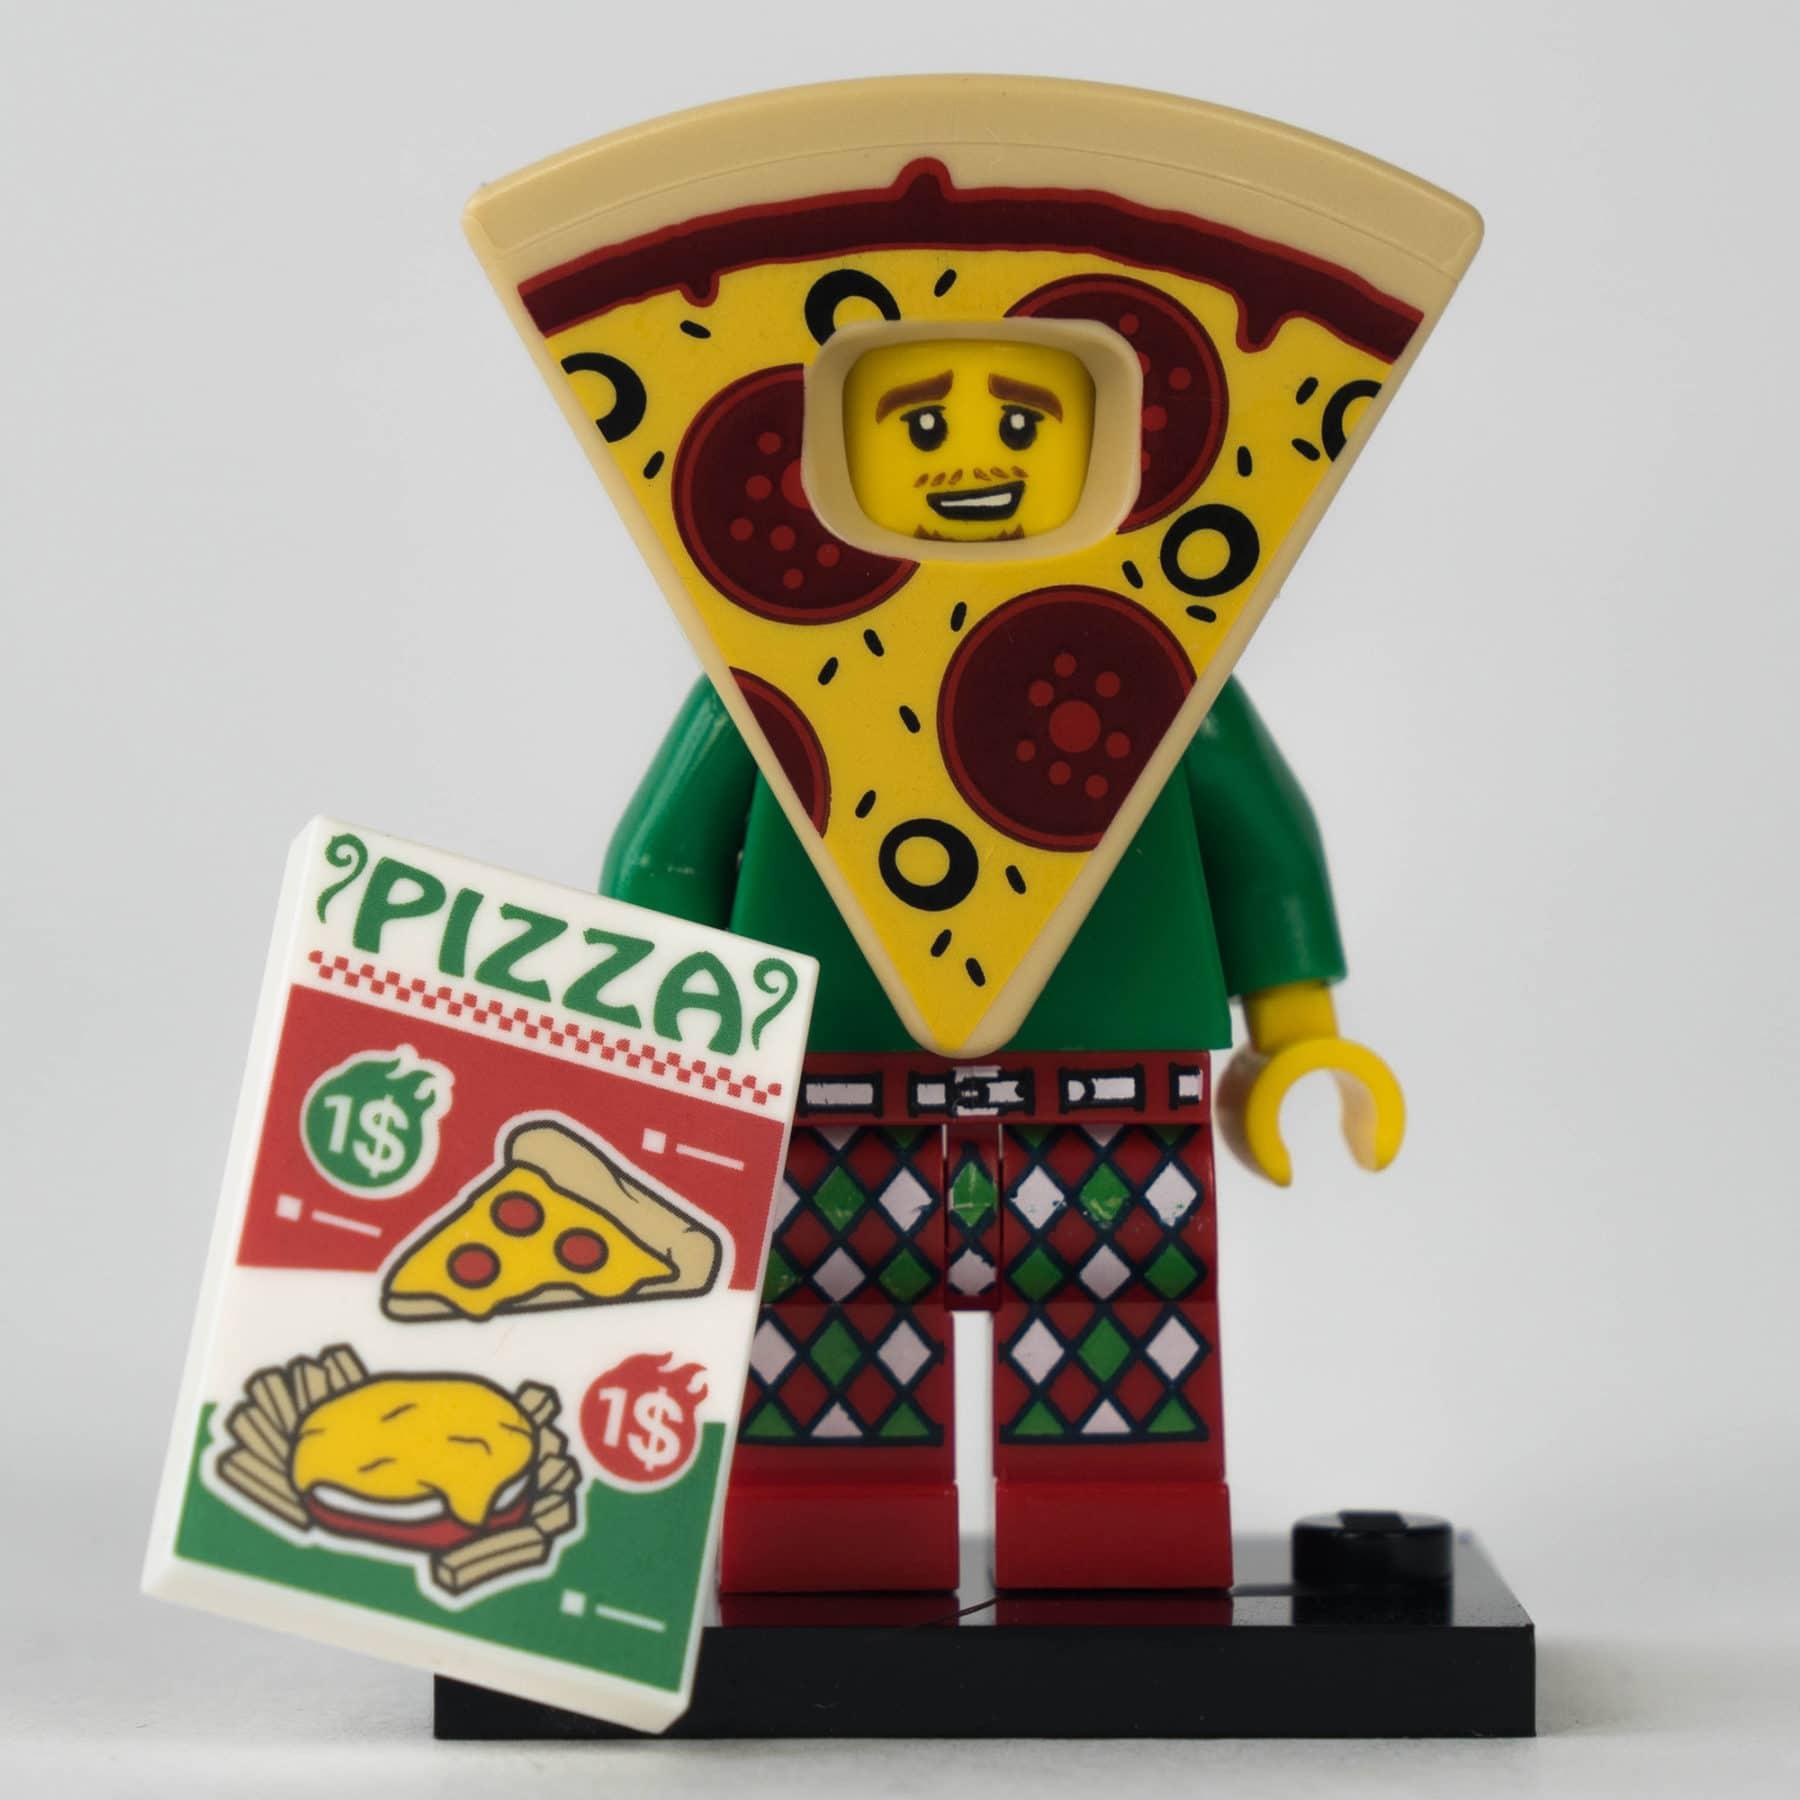 LEGO 71025 Minifigur: Pizza-Typ